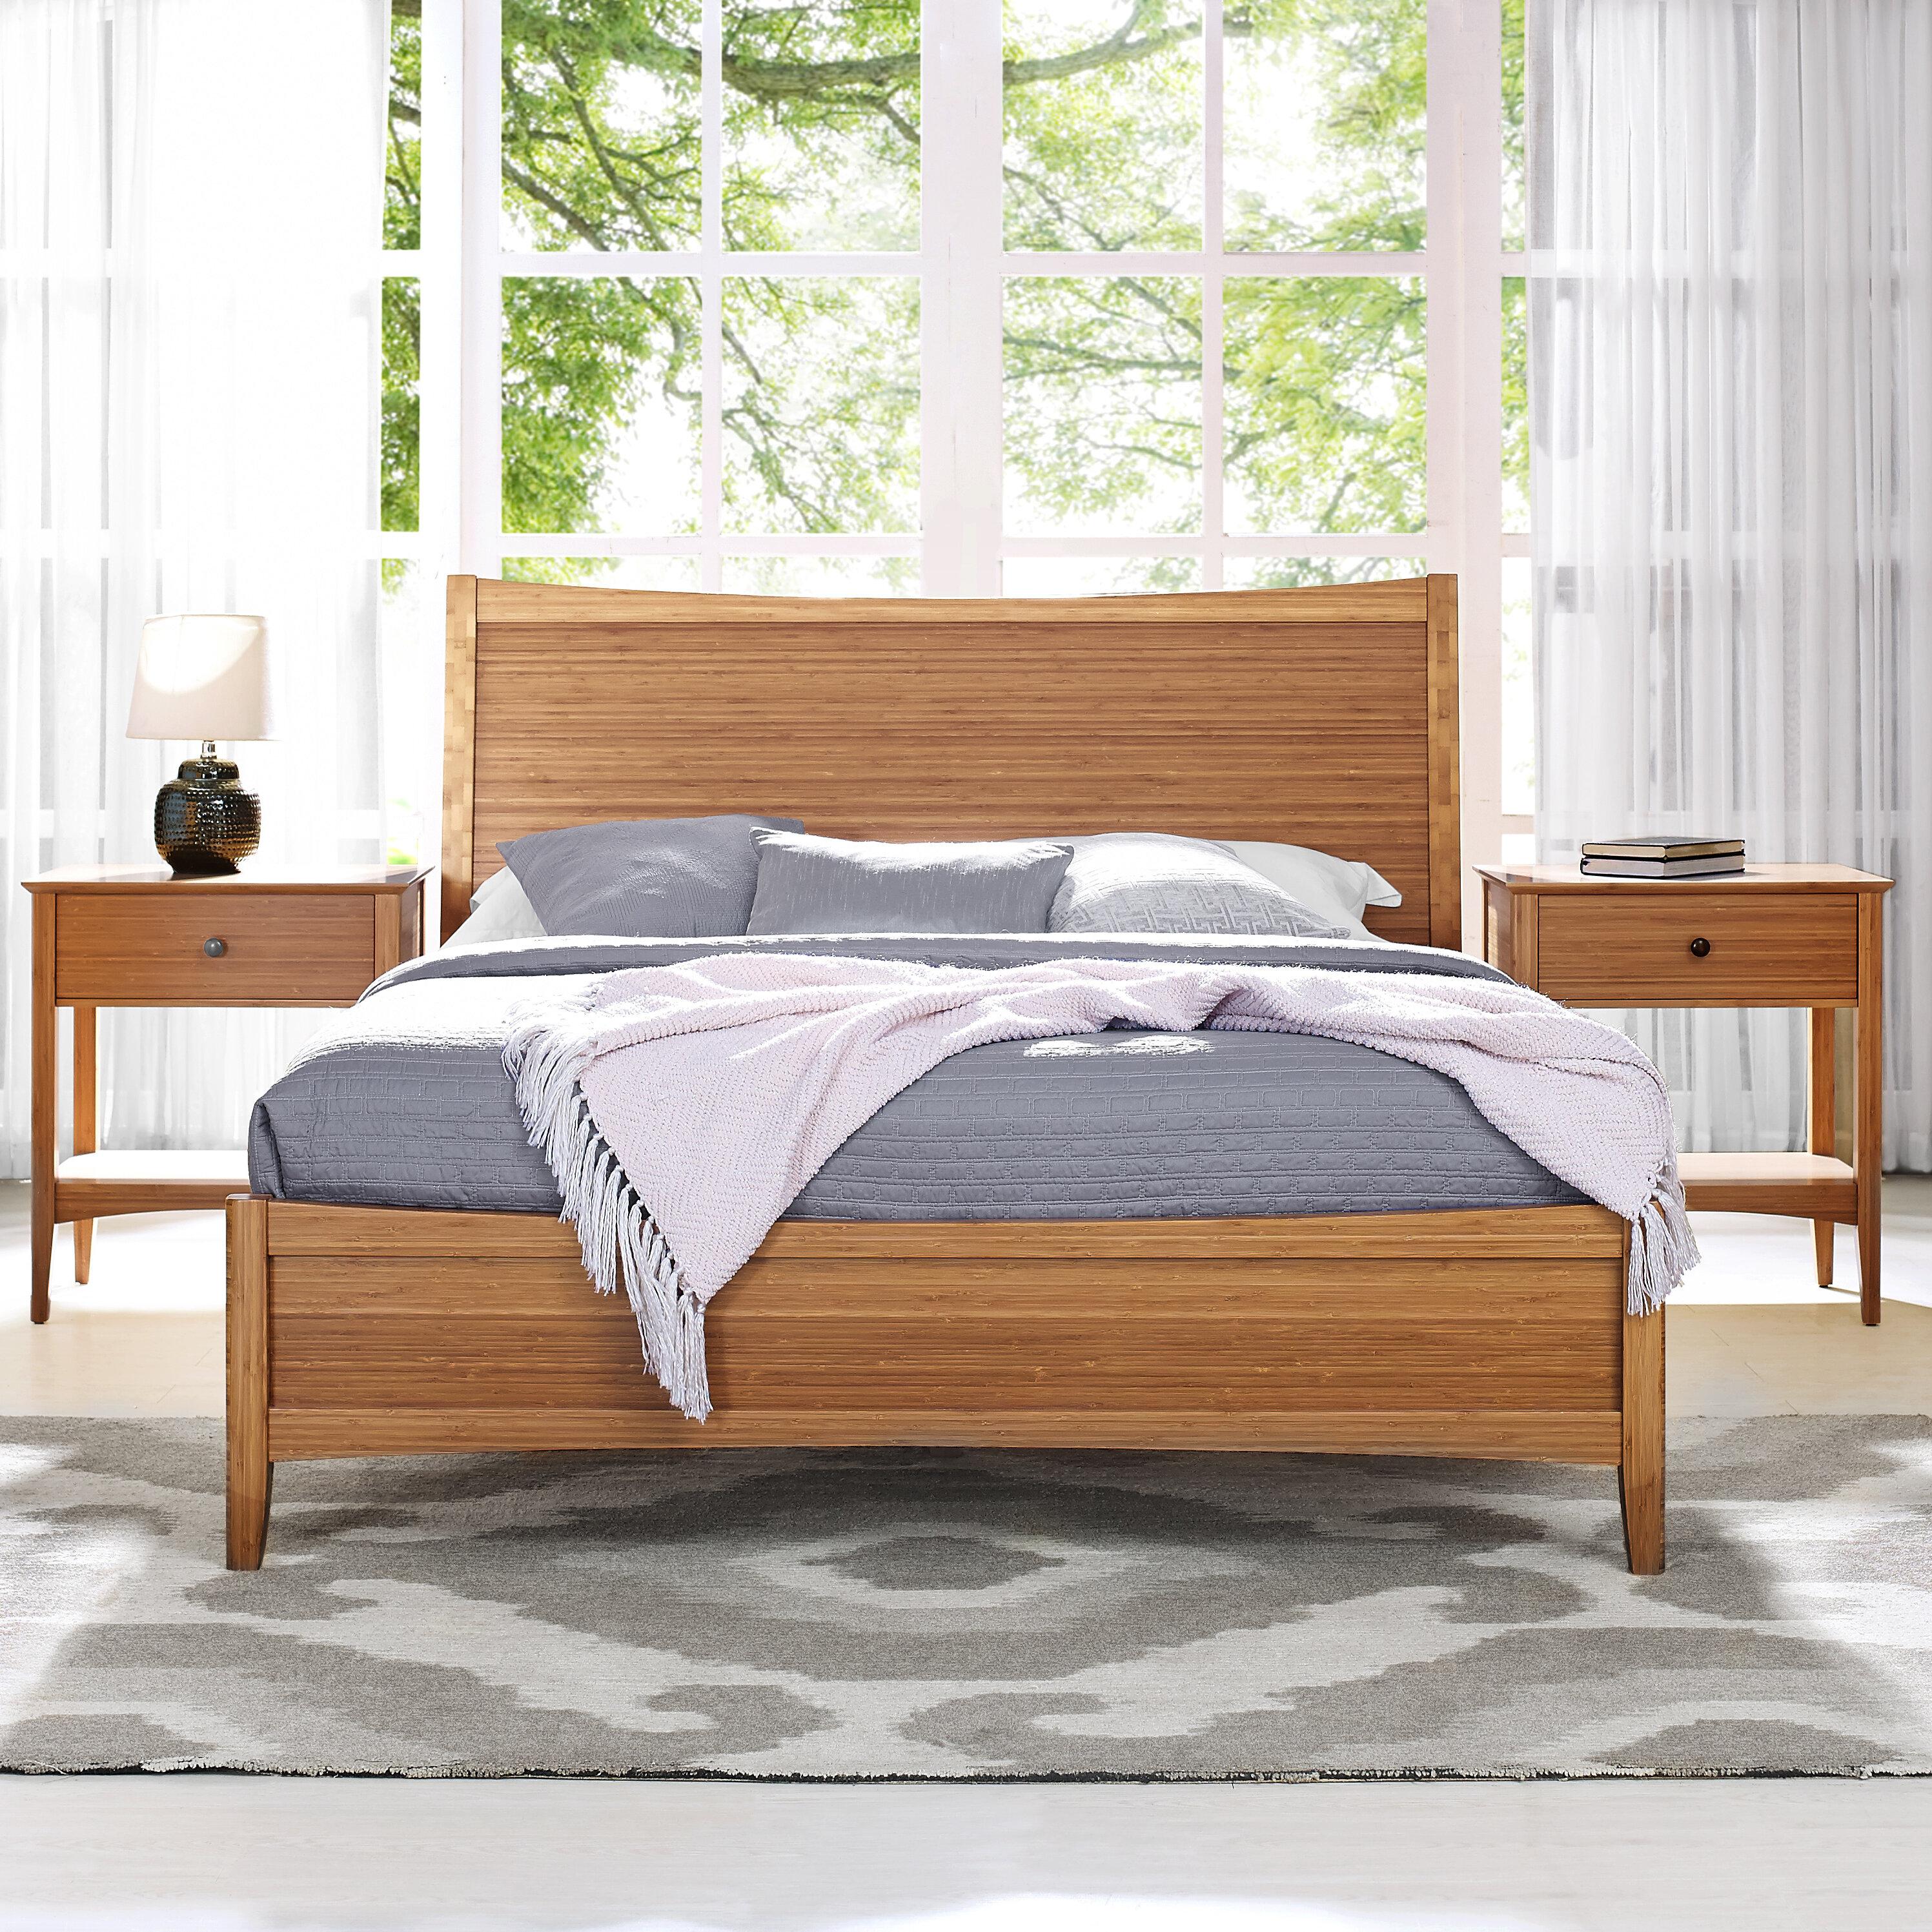 Ethelsville Solid Wood Platform Bed Reviews Joss Main